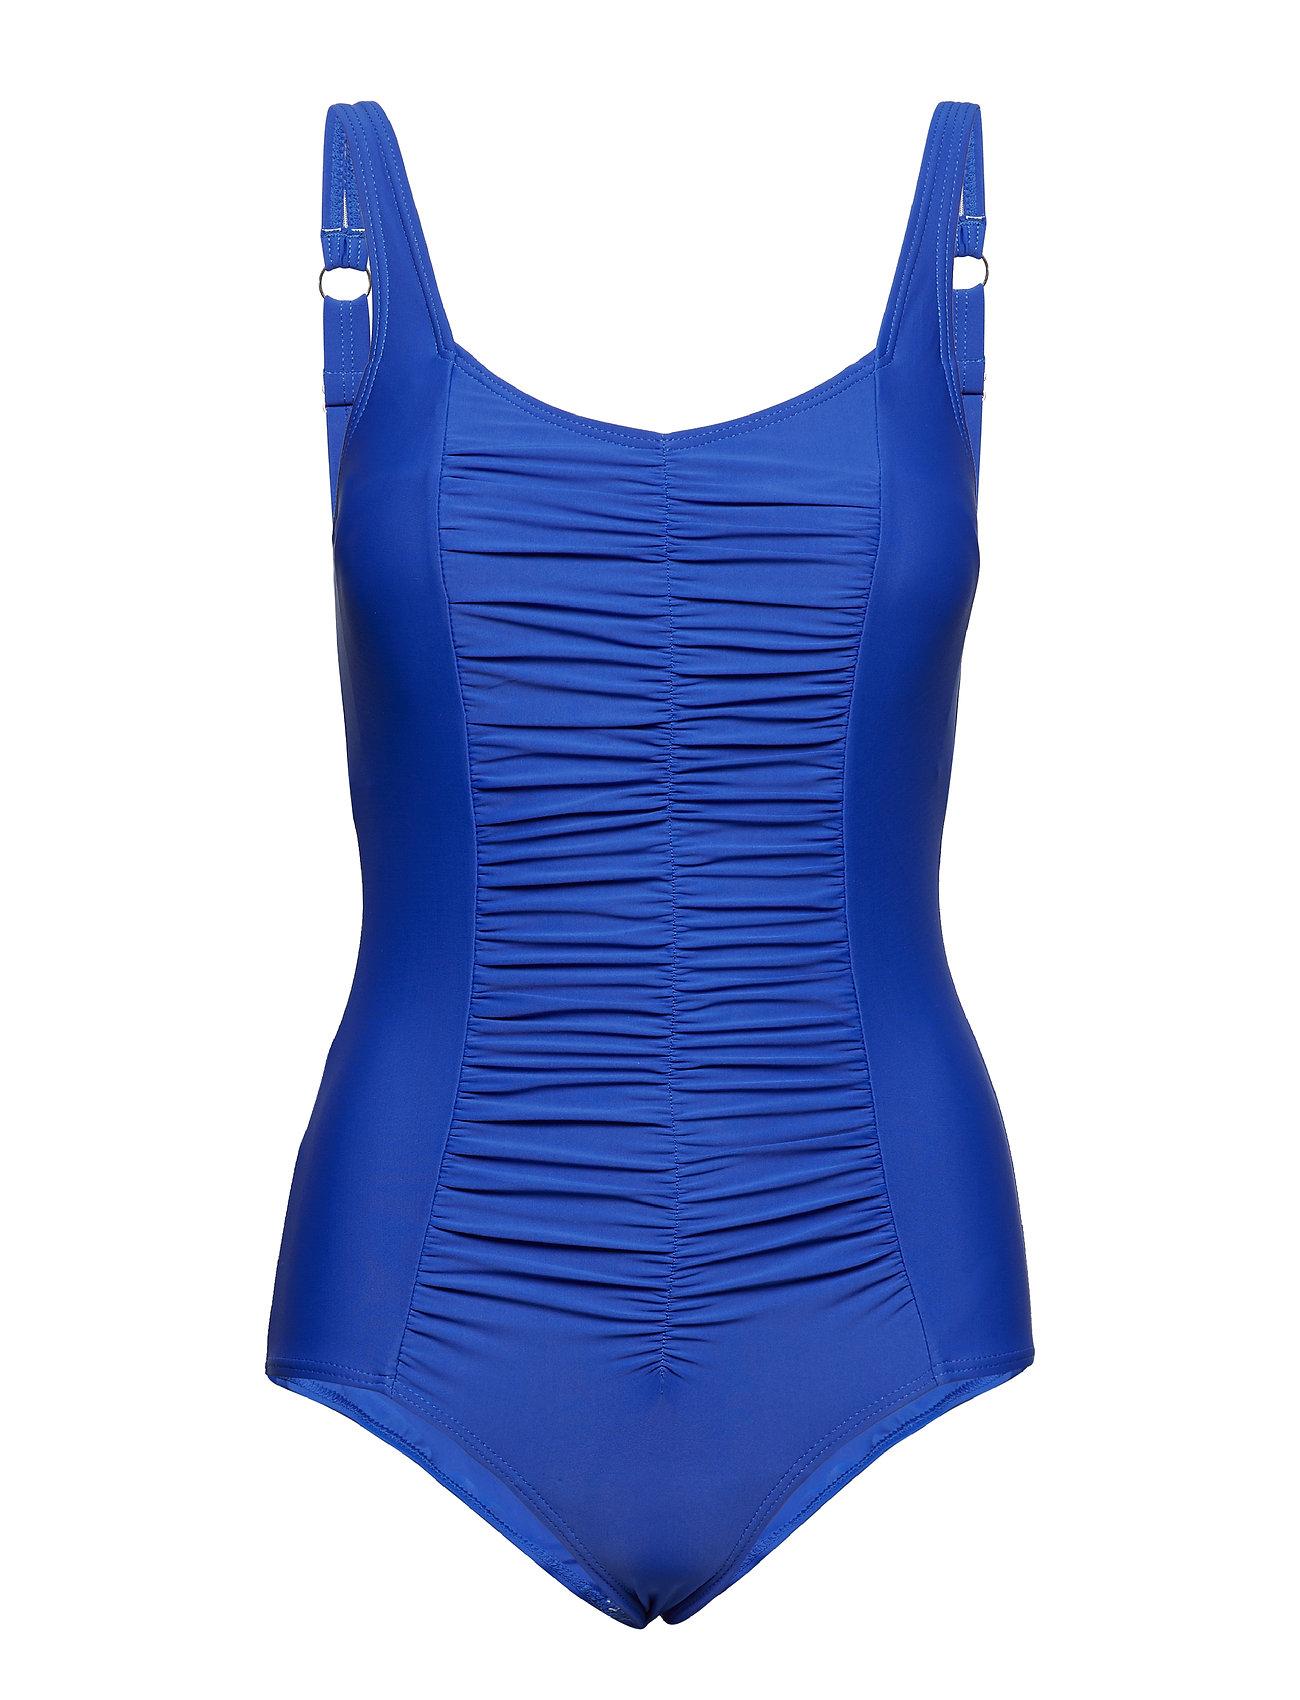 Wiki Swimsuit Valentina - OXFORD